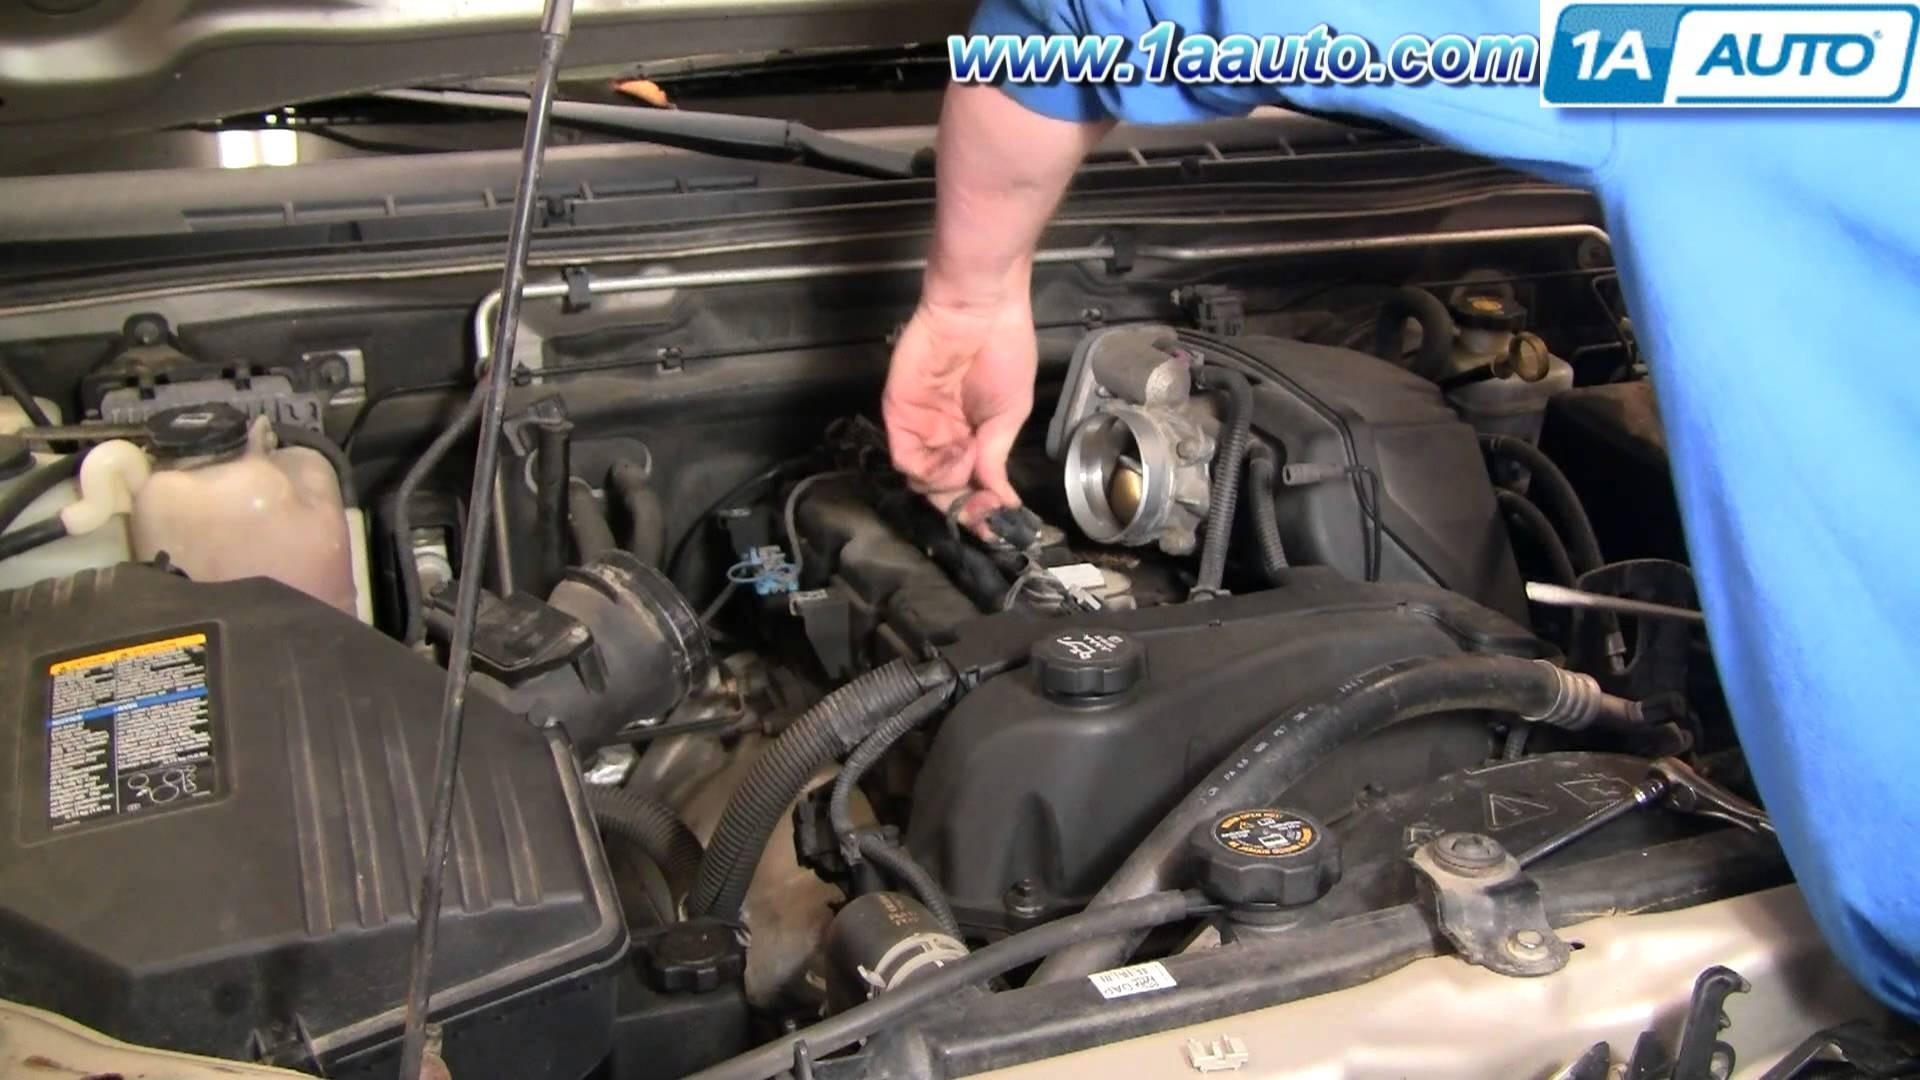 2004 Chevy Colorado Parts Diagram How to Install Replace Engine Ignition Coils Chevy Colorado 04 12 Of 2004 Chevy Colorado Parts Diagram